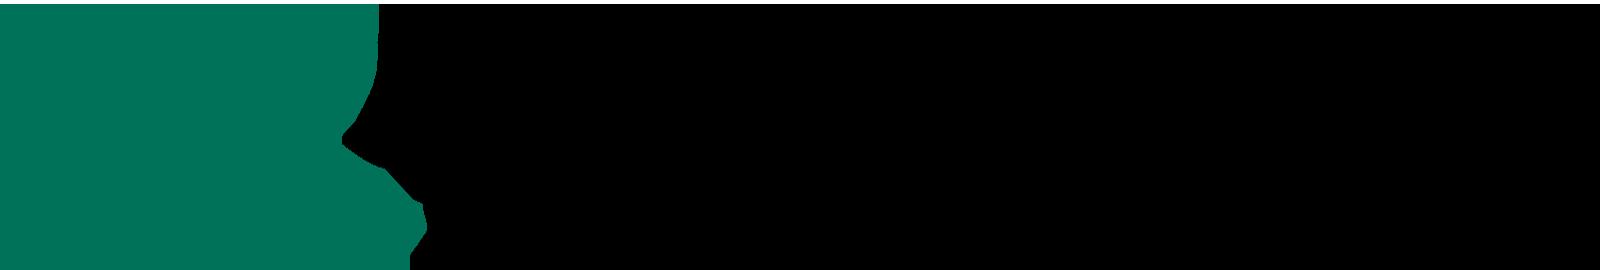 mehilainen_vaaka_slogan_rgb-2